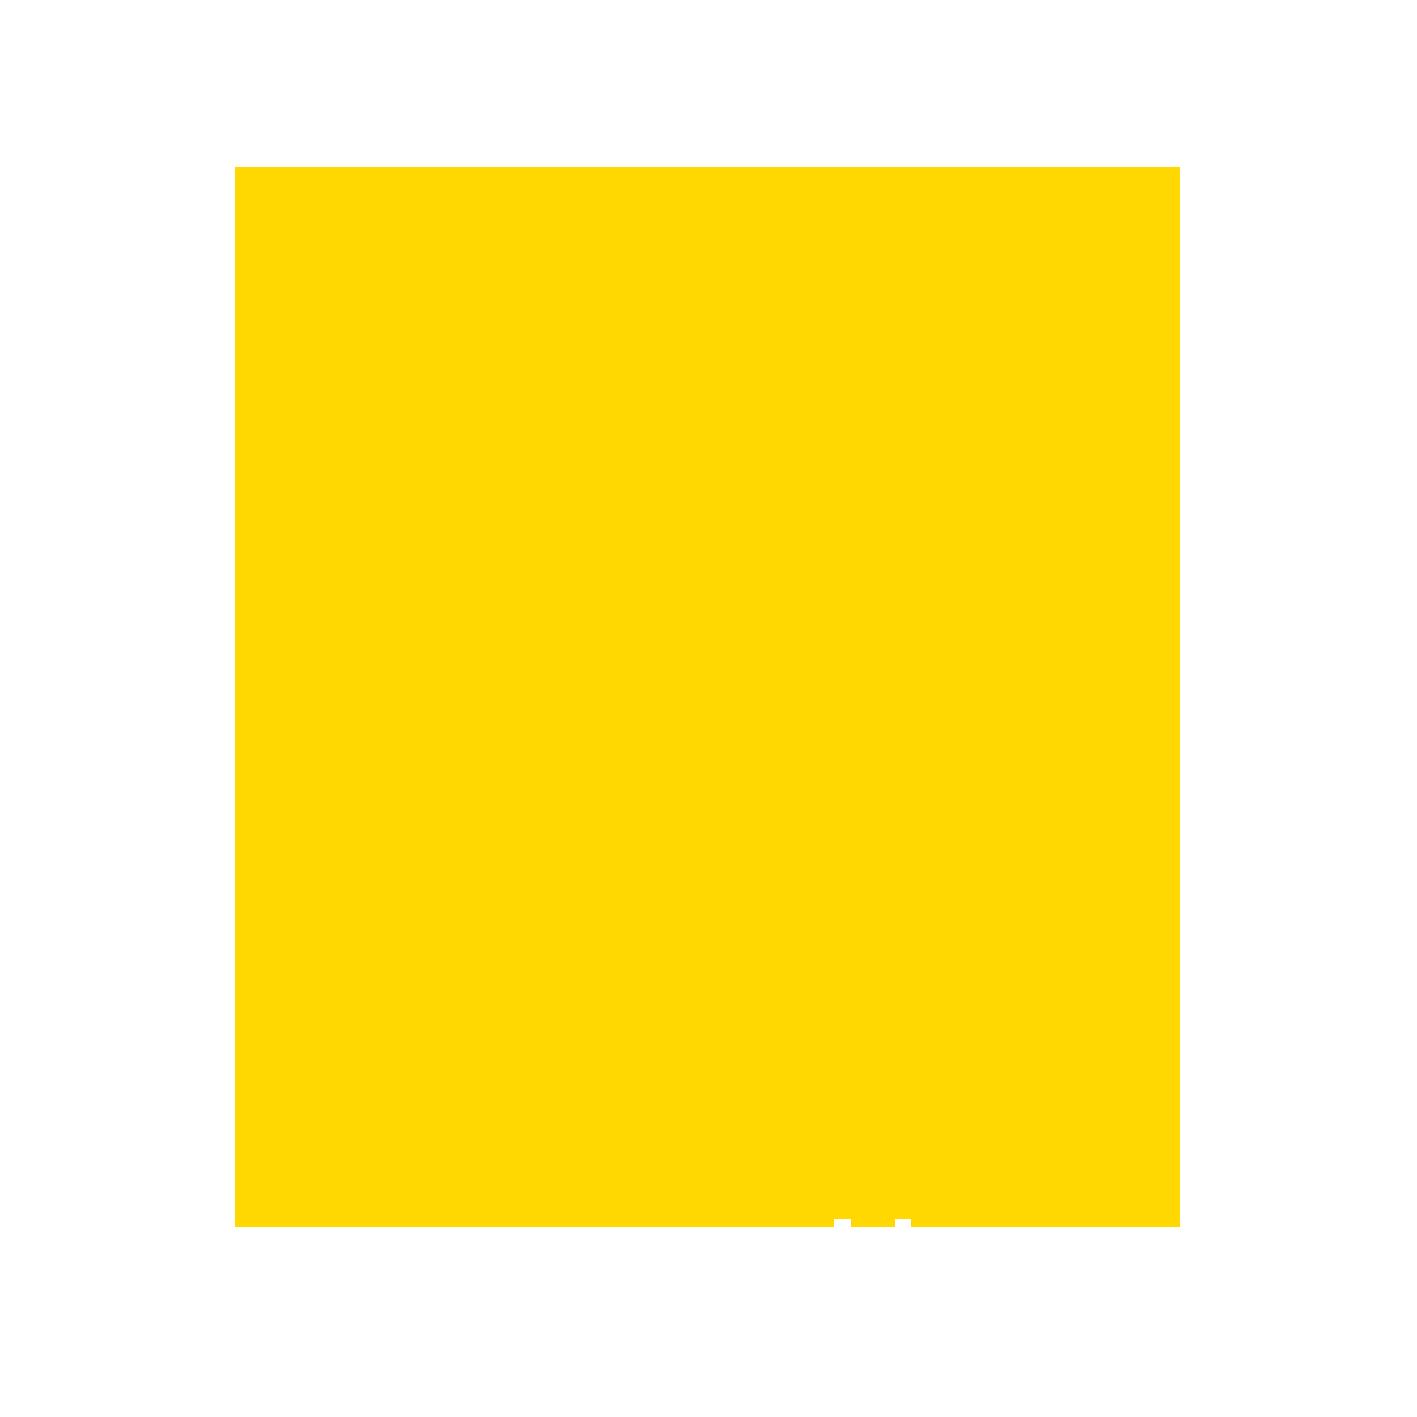 Naoussa houses